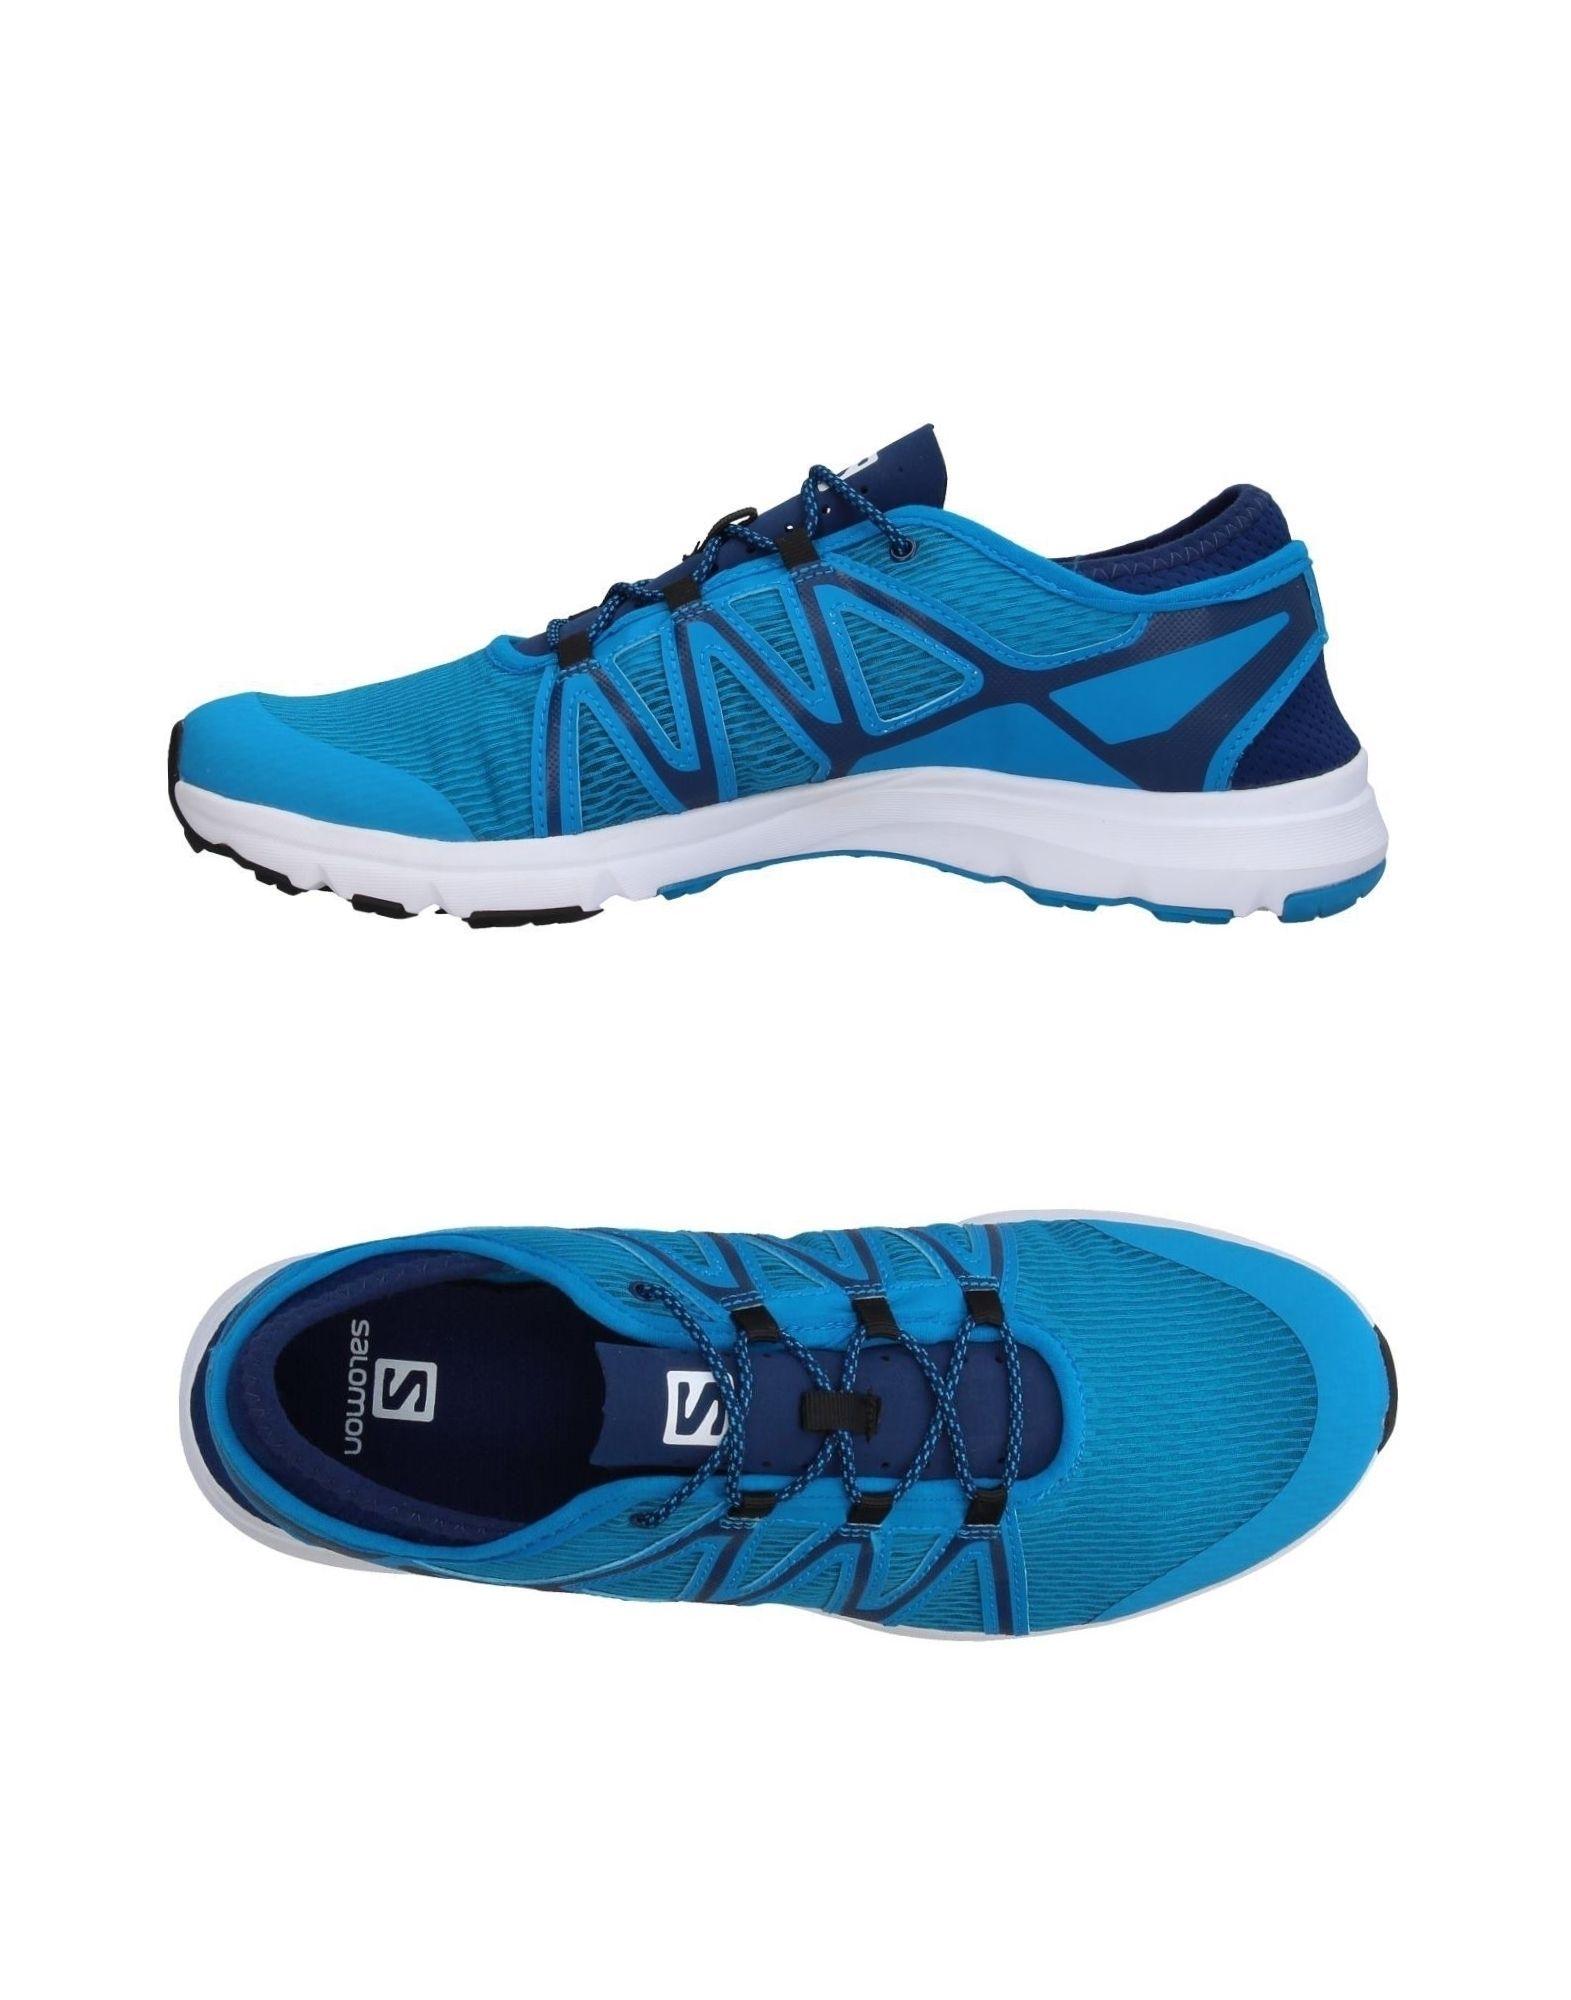 Salomon Sneakers Sneakers - Men Salomon Sneakers Salomon online on  United Kingdom - 11399469NU 6c5d8b